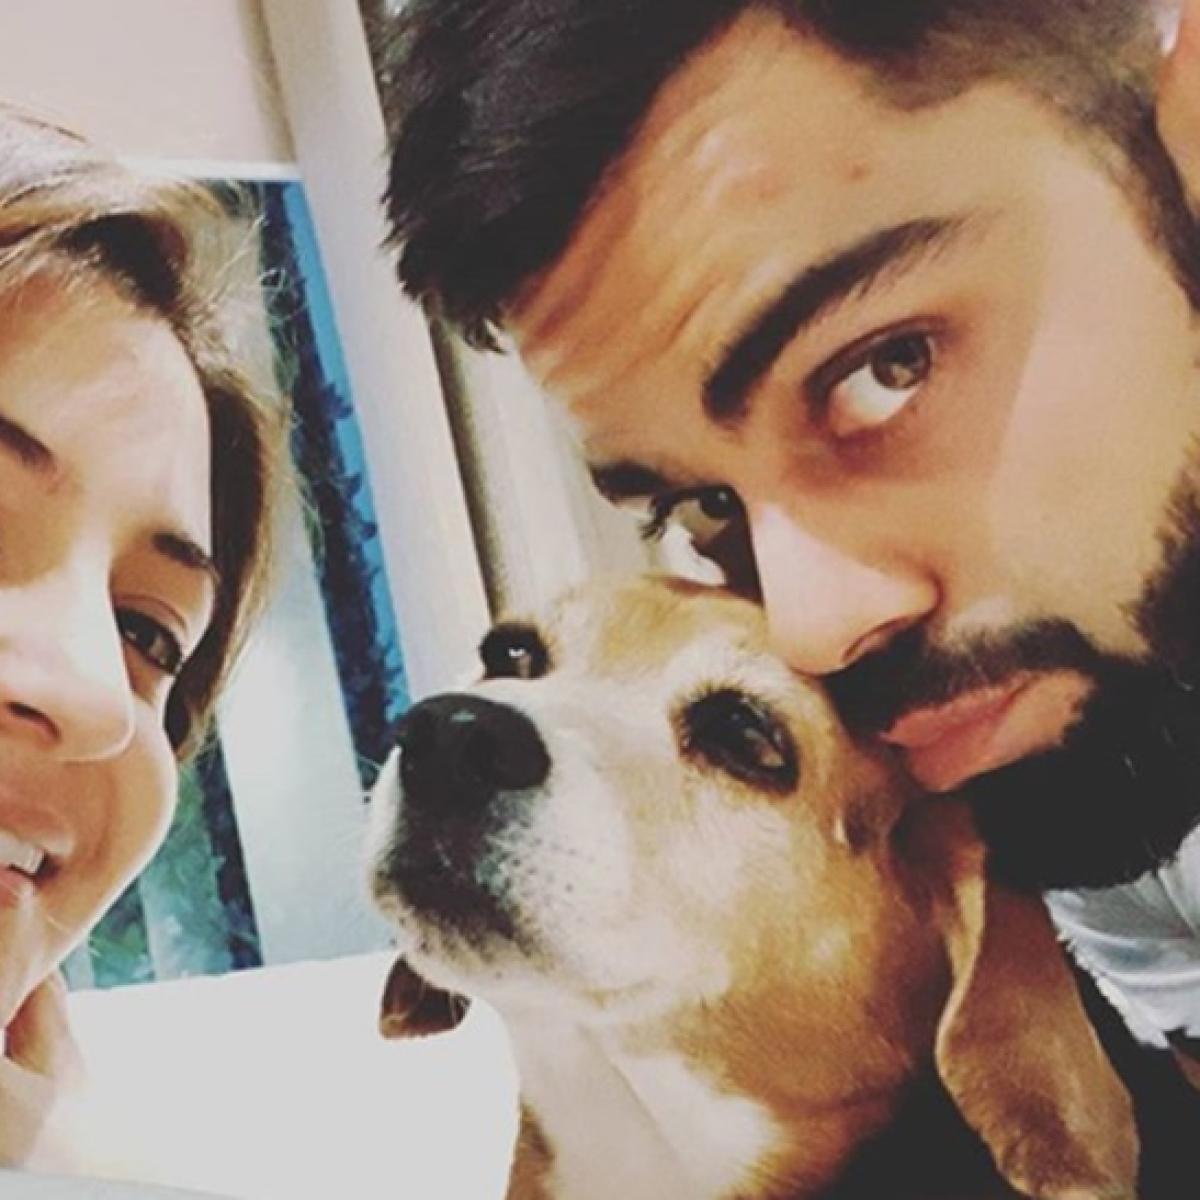 RIP Bruno: Virat Kohli, Anushka Sharma mourn death of their pet